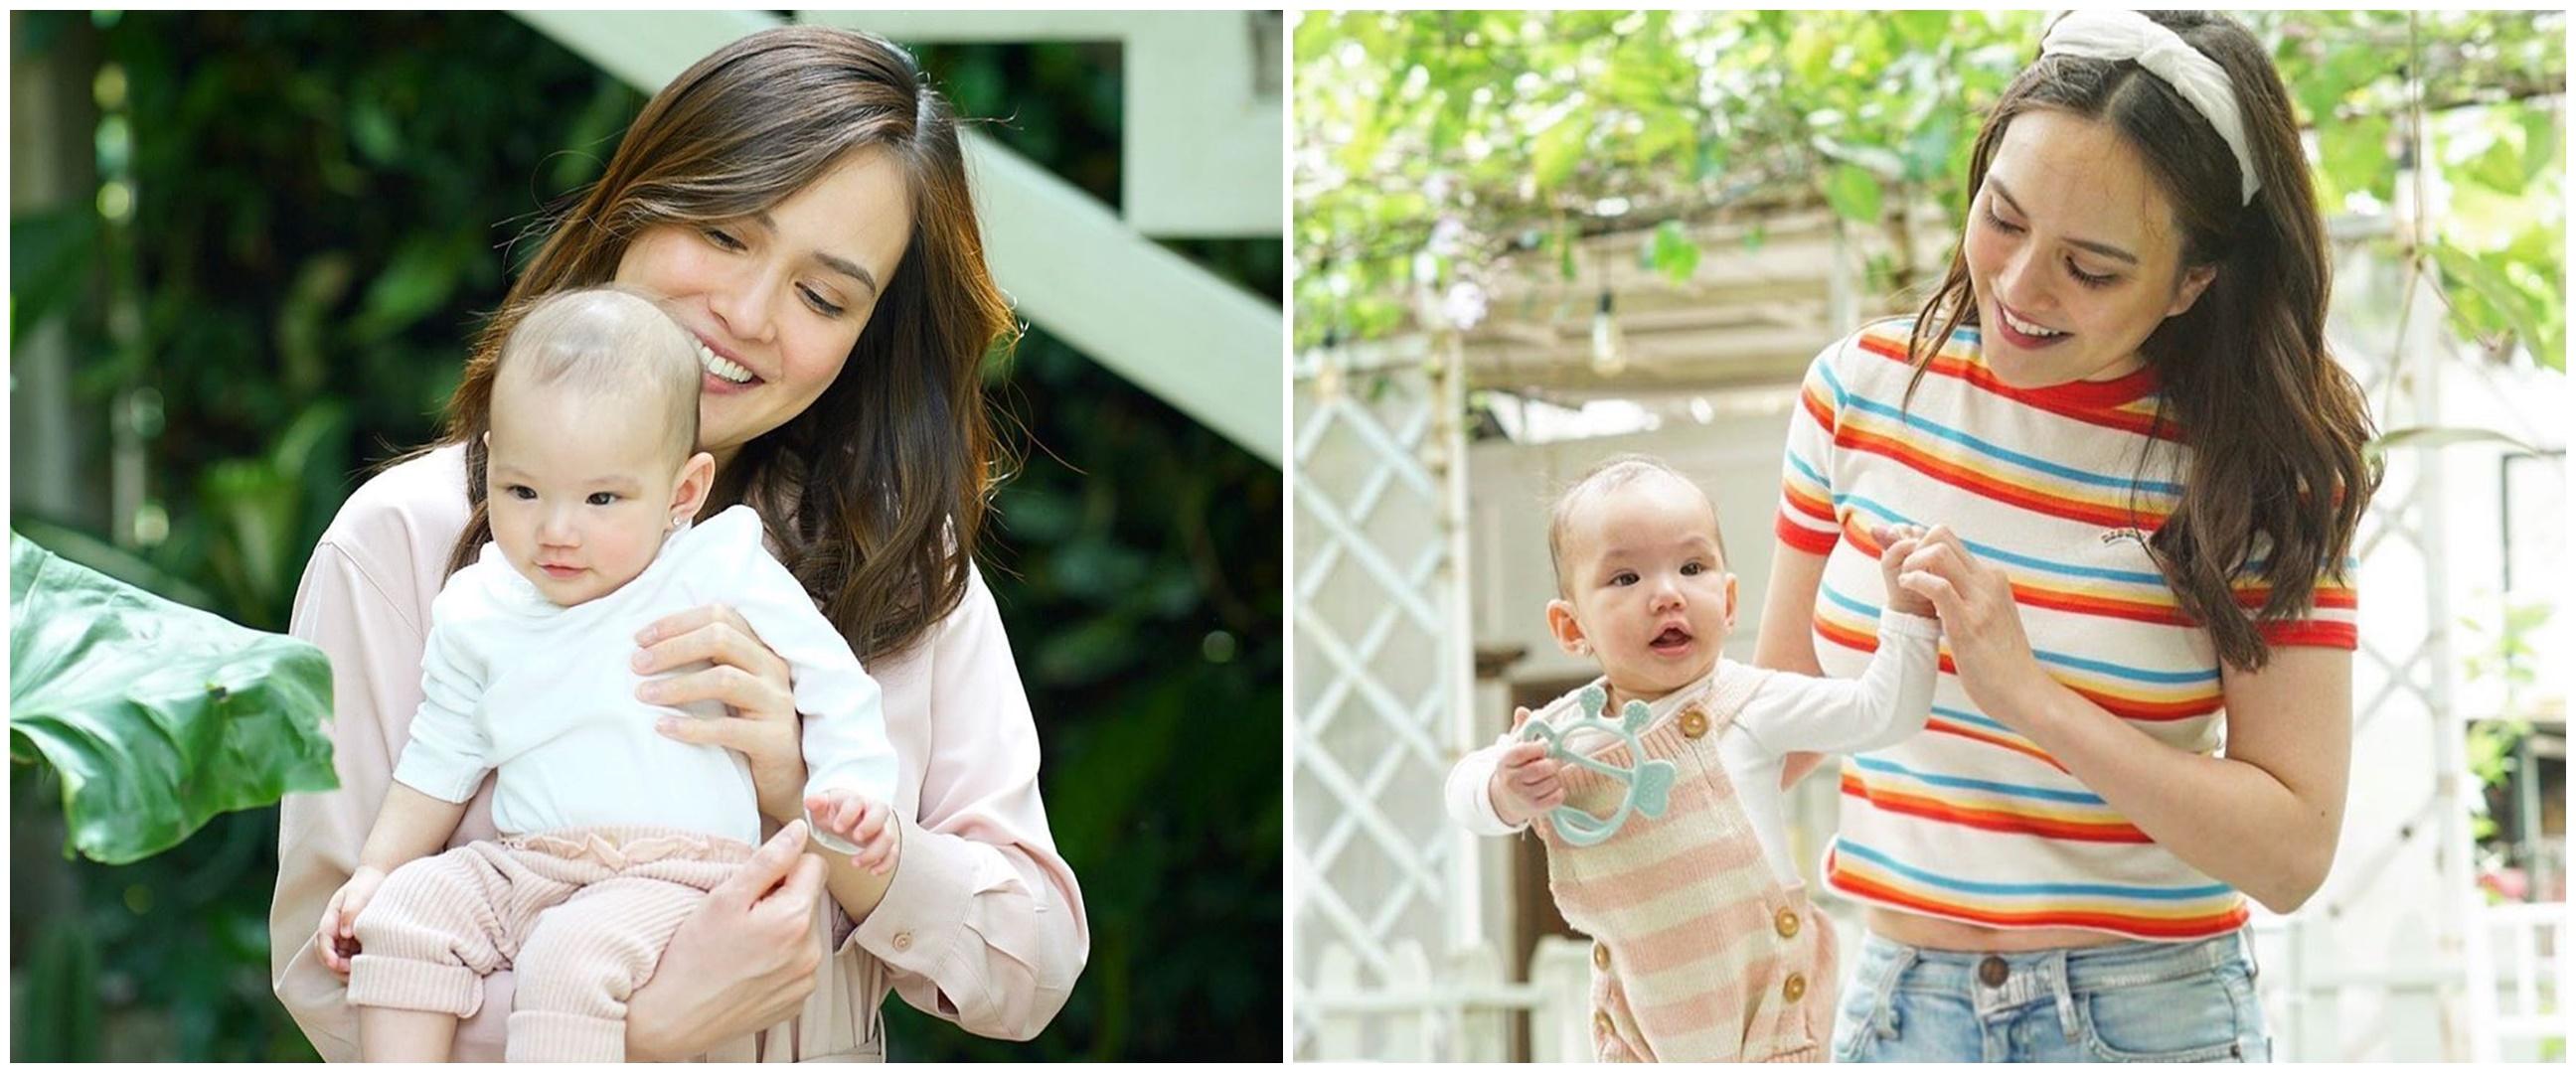 5 Momen MPASI anak Shandy Aulia, mulai dari usia 4 bulan